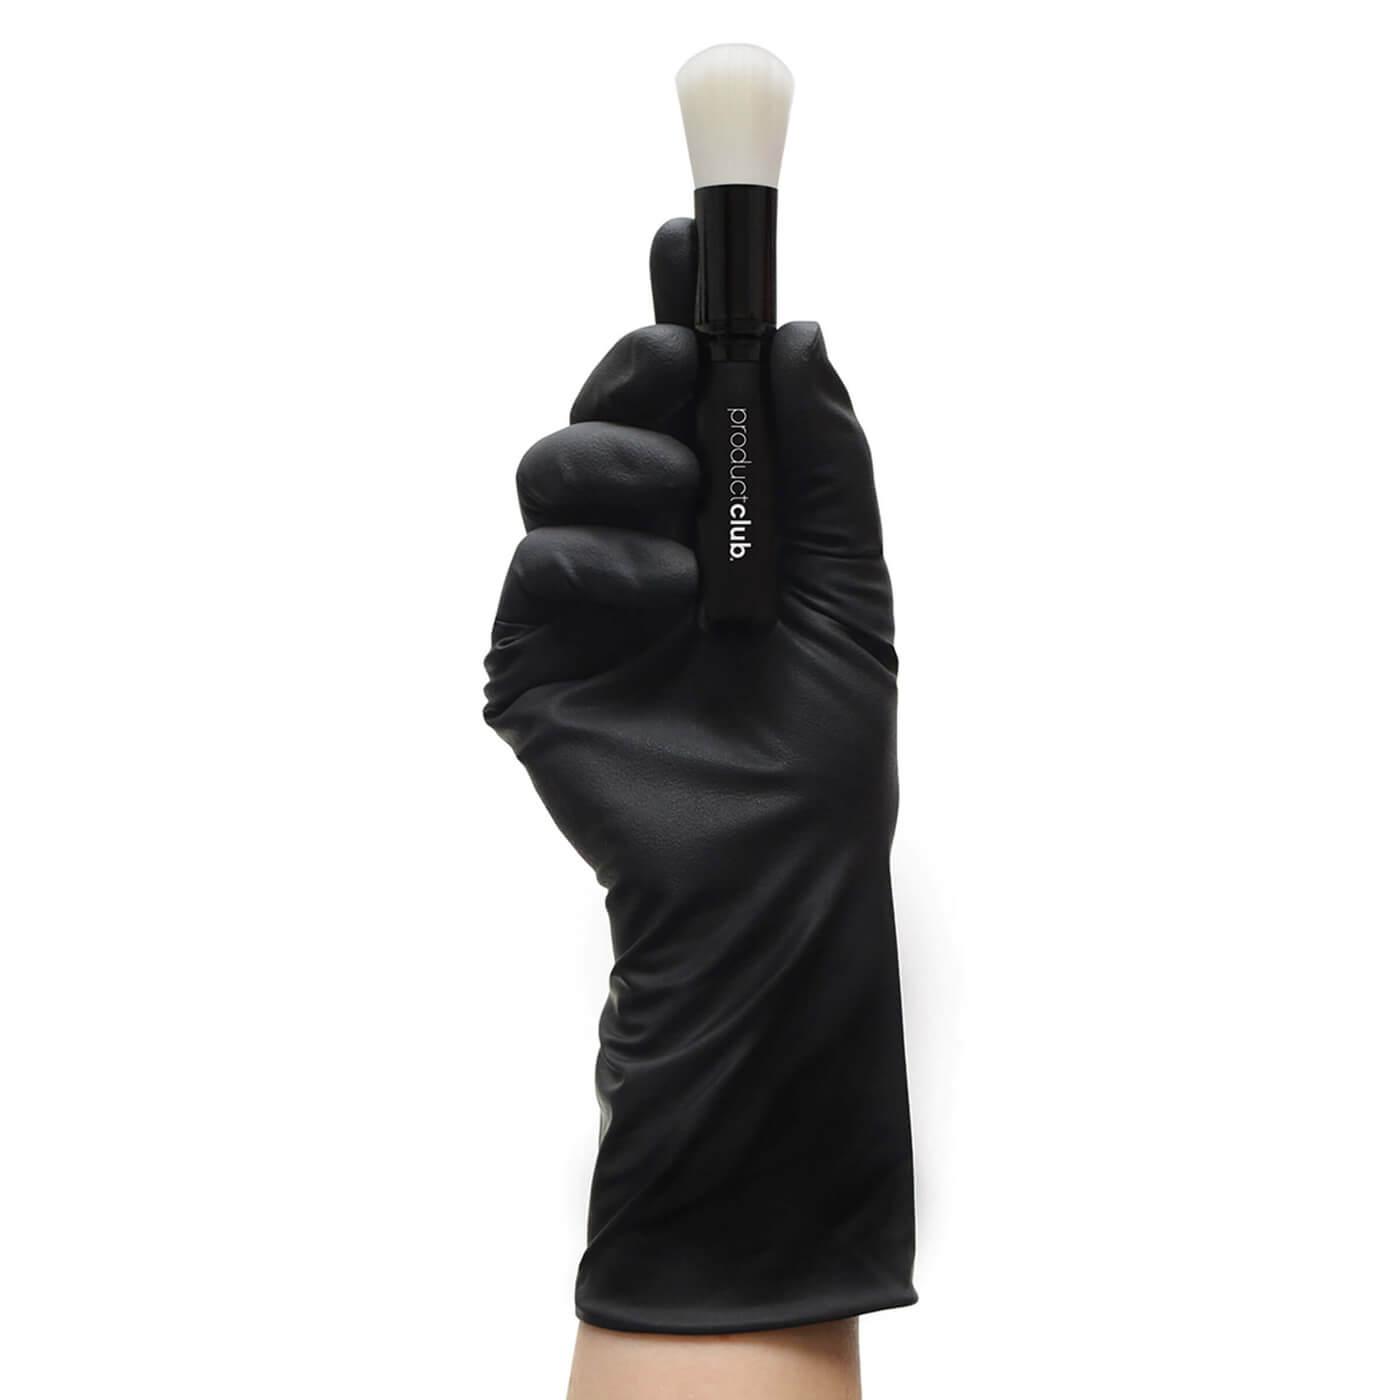 JBLG-12M Reuseable Hair Dye Gloves Medium